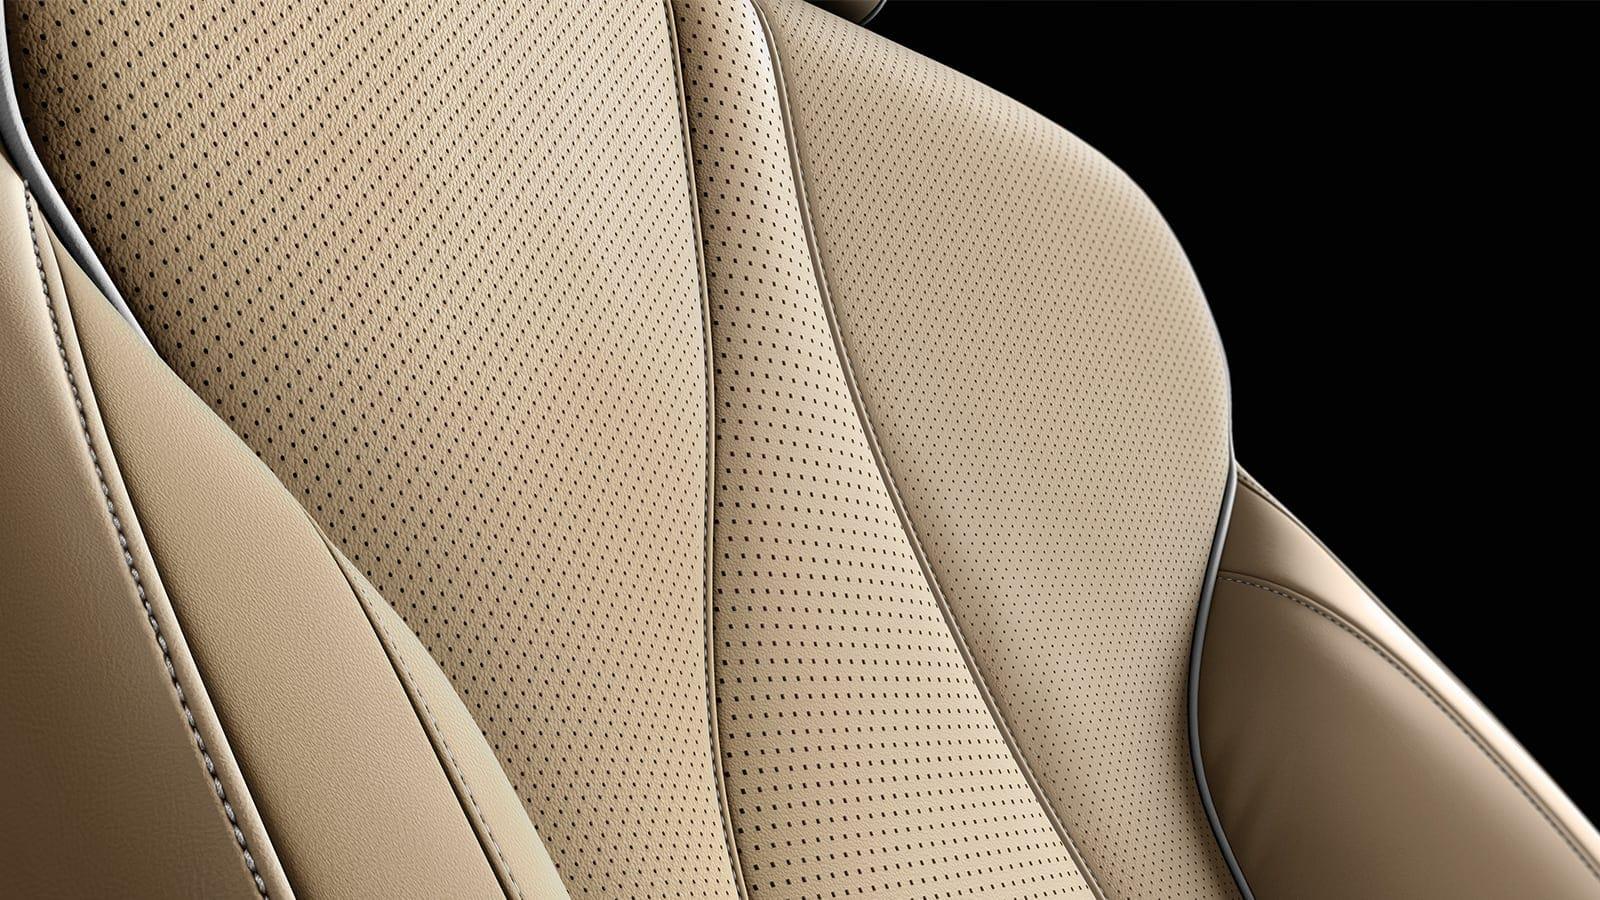 Plush Interior of the 2020 Acura RDX